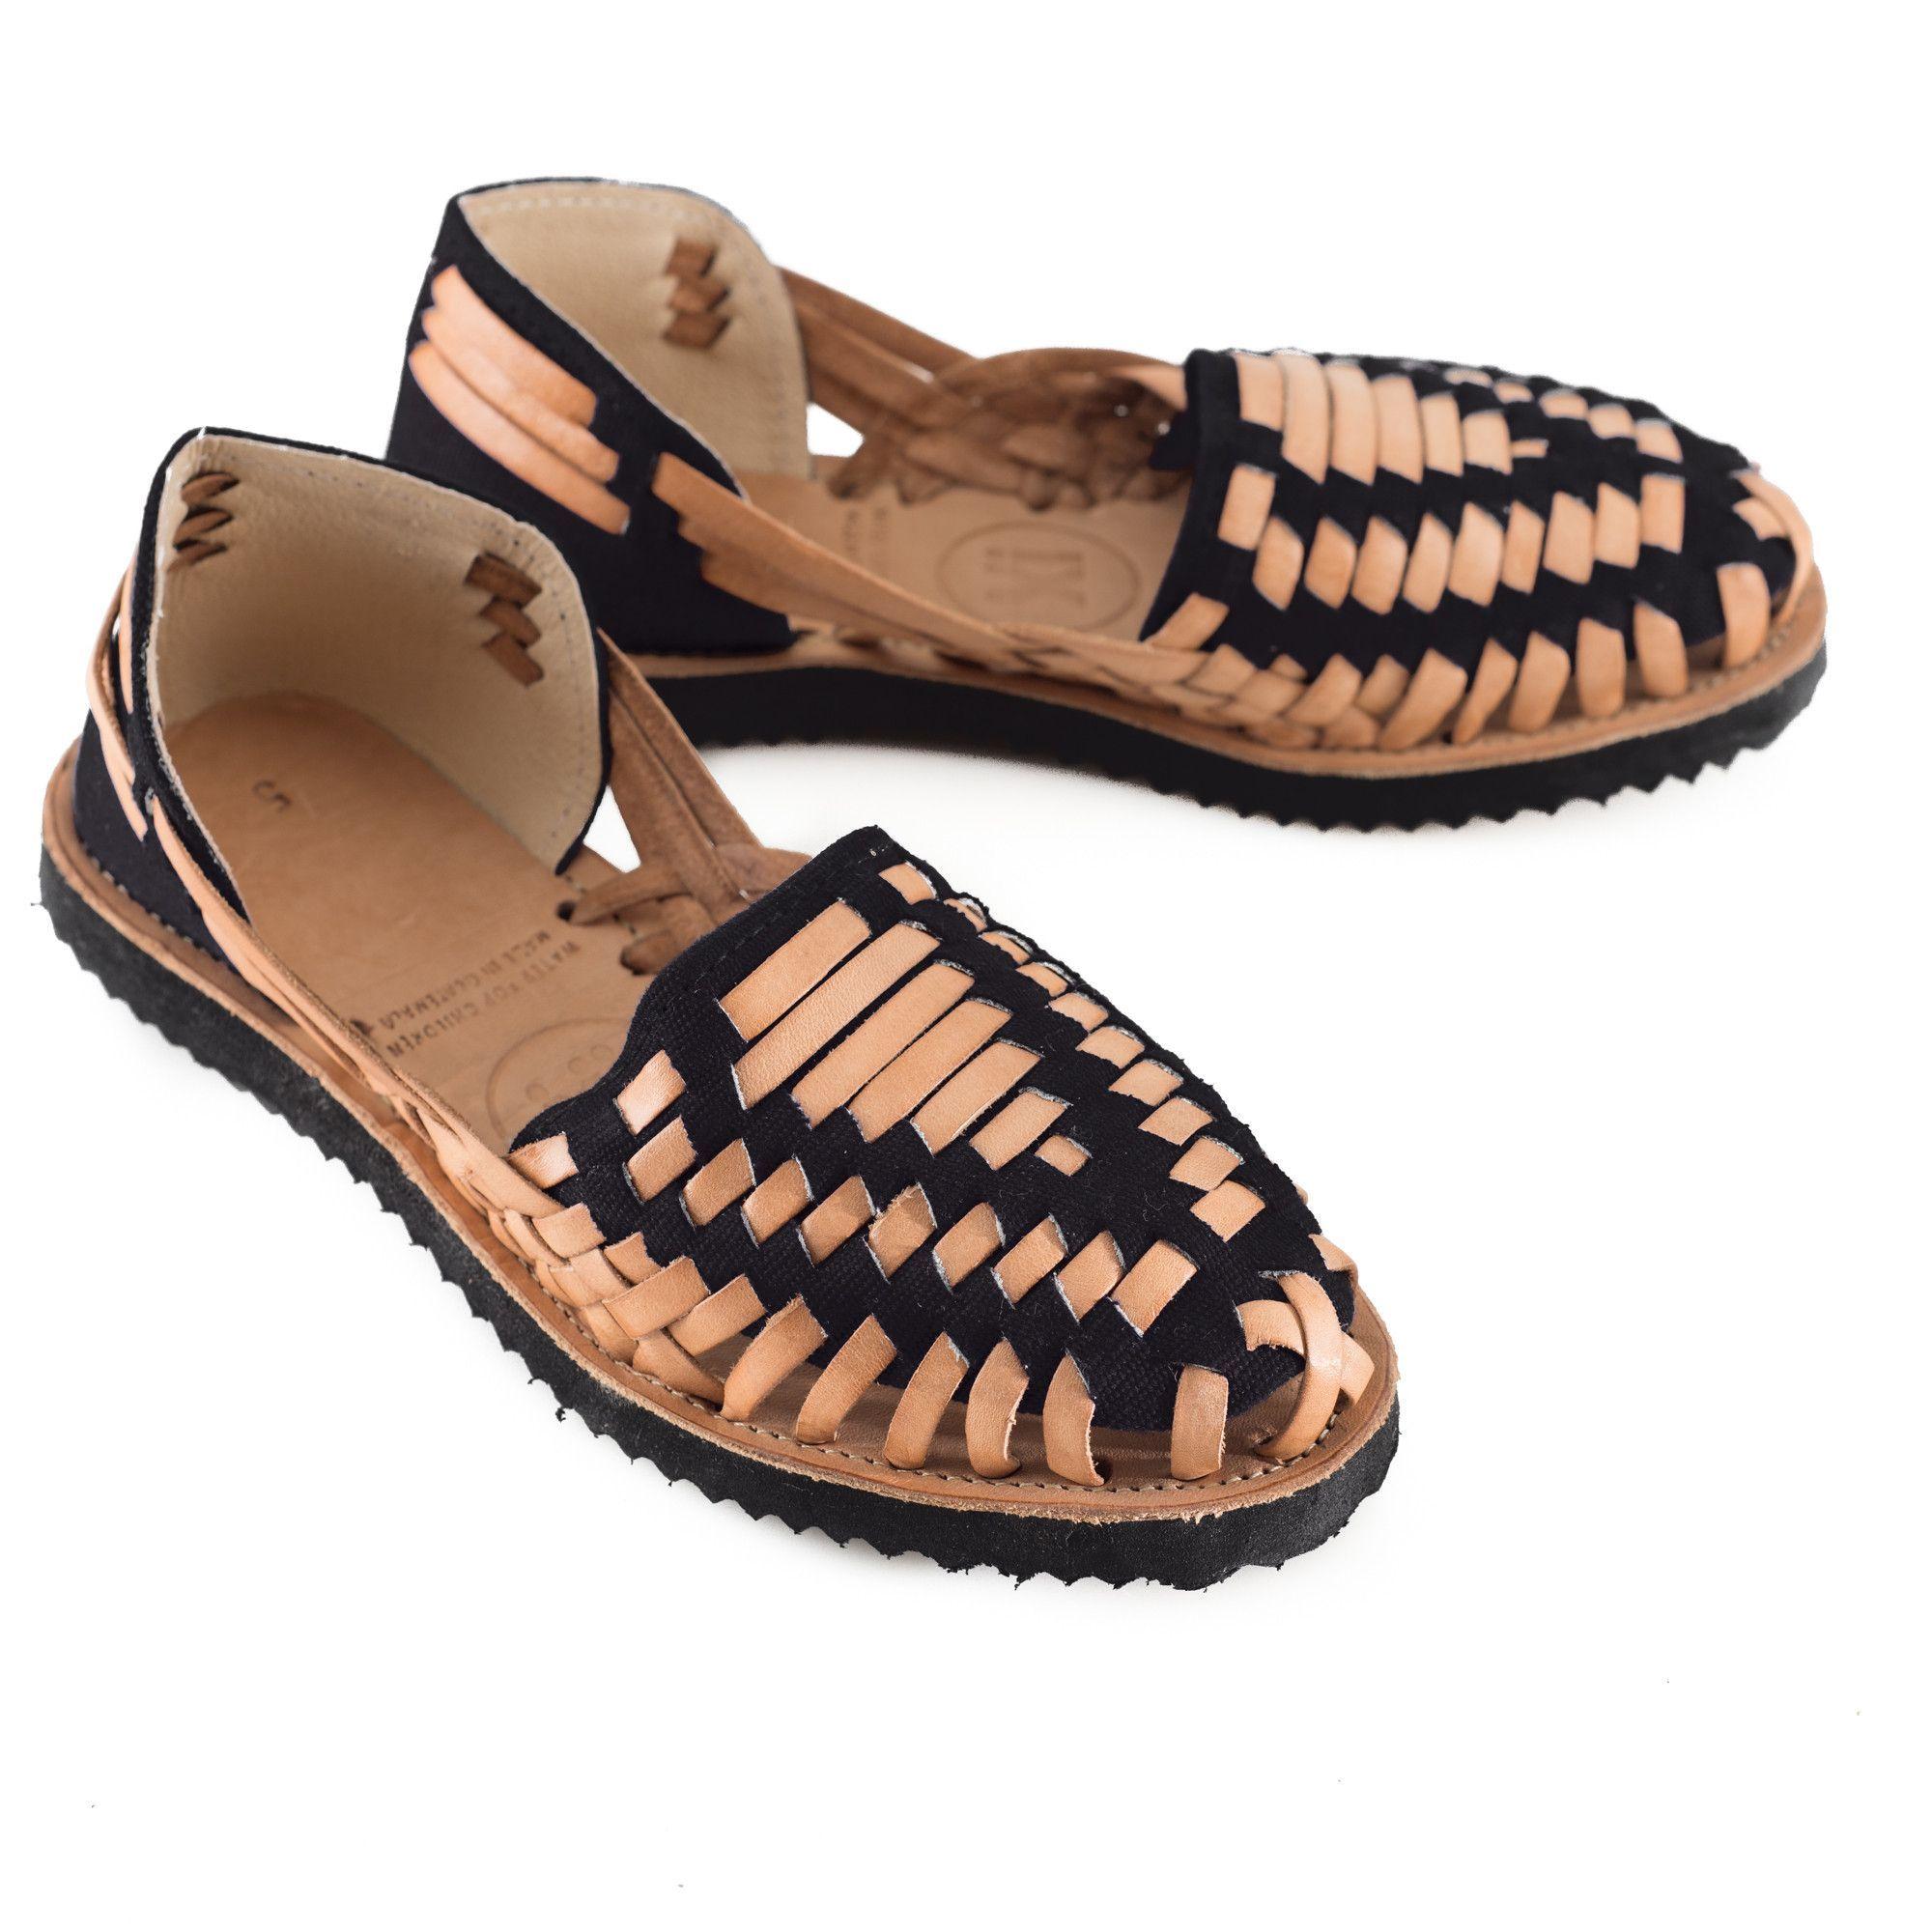 Woven Leather Huarache Sandals